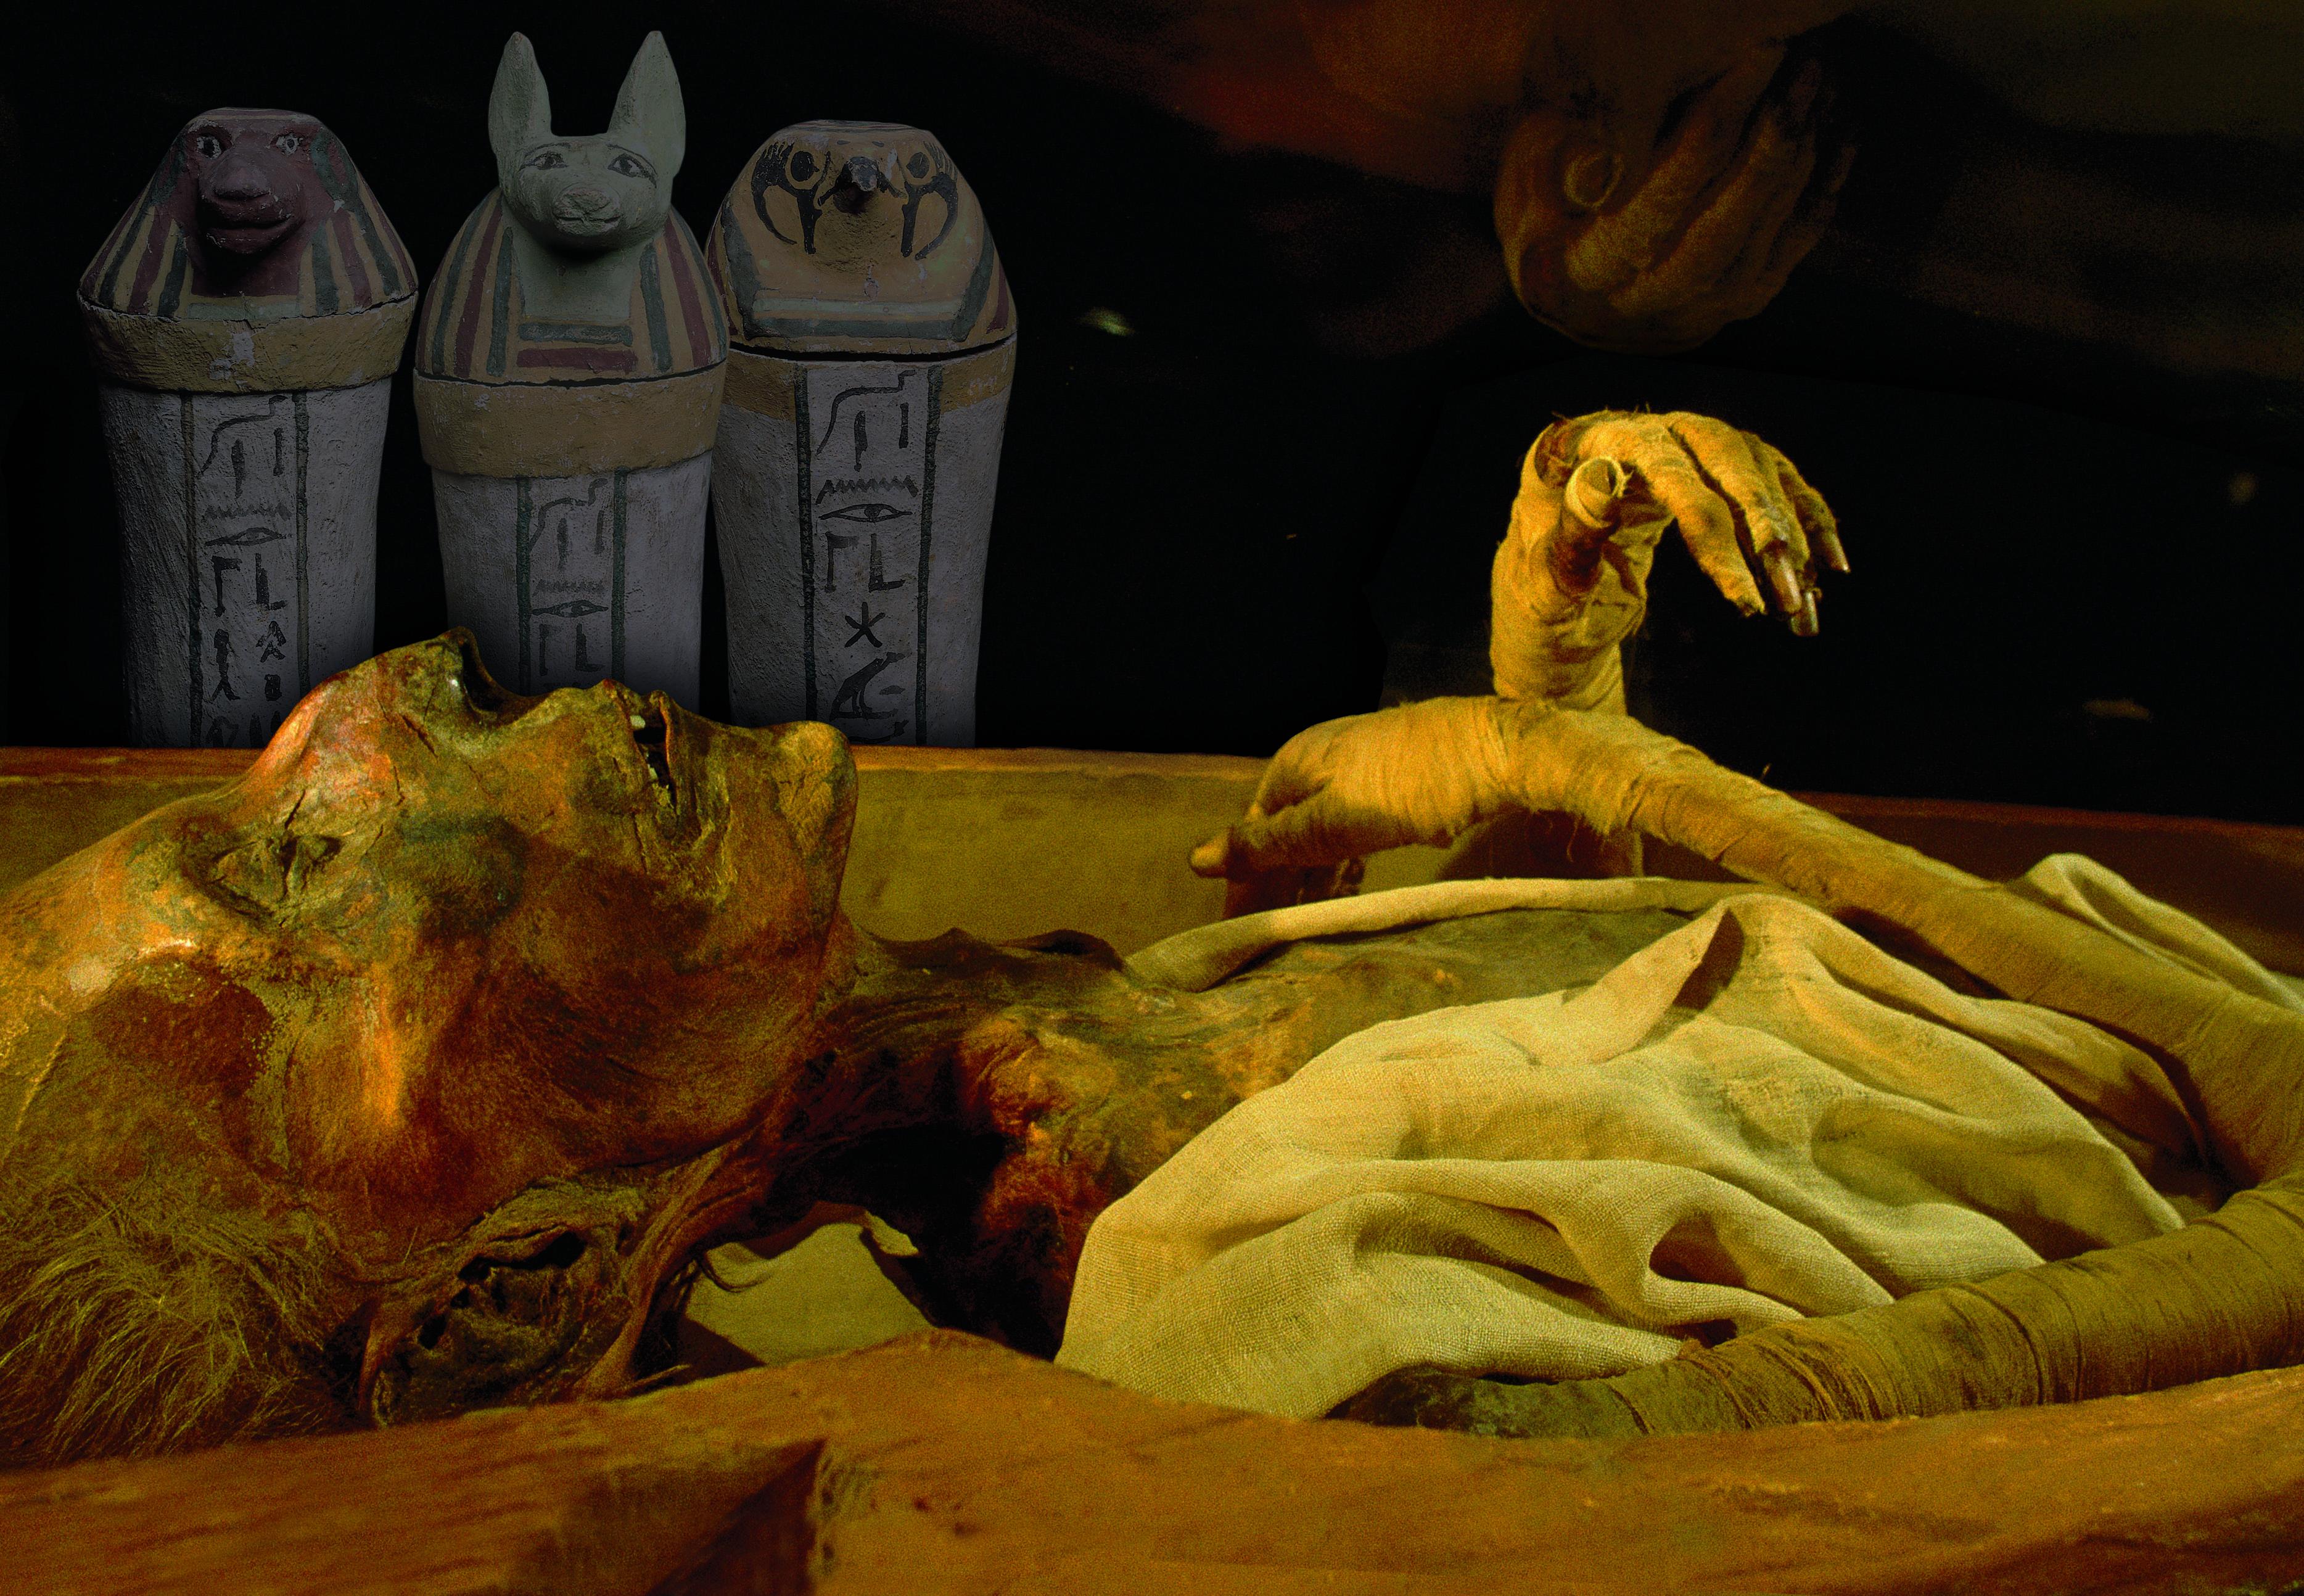 Varlden aldsta ost hittad pa mumie